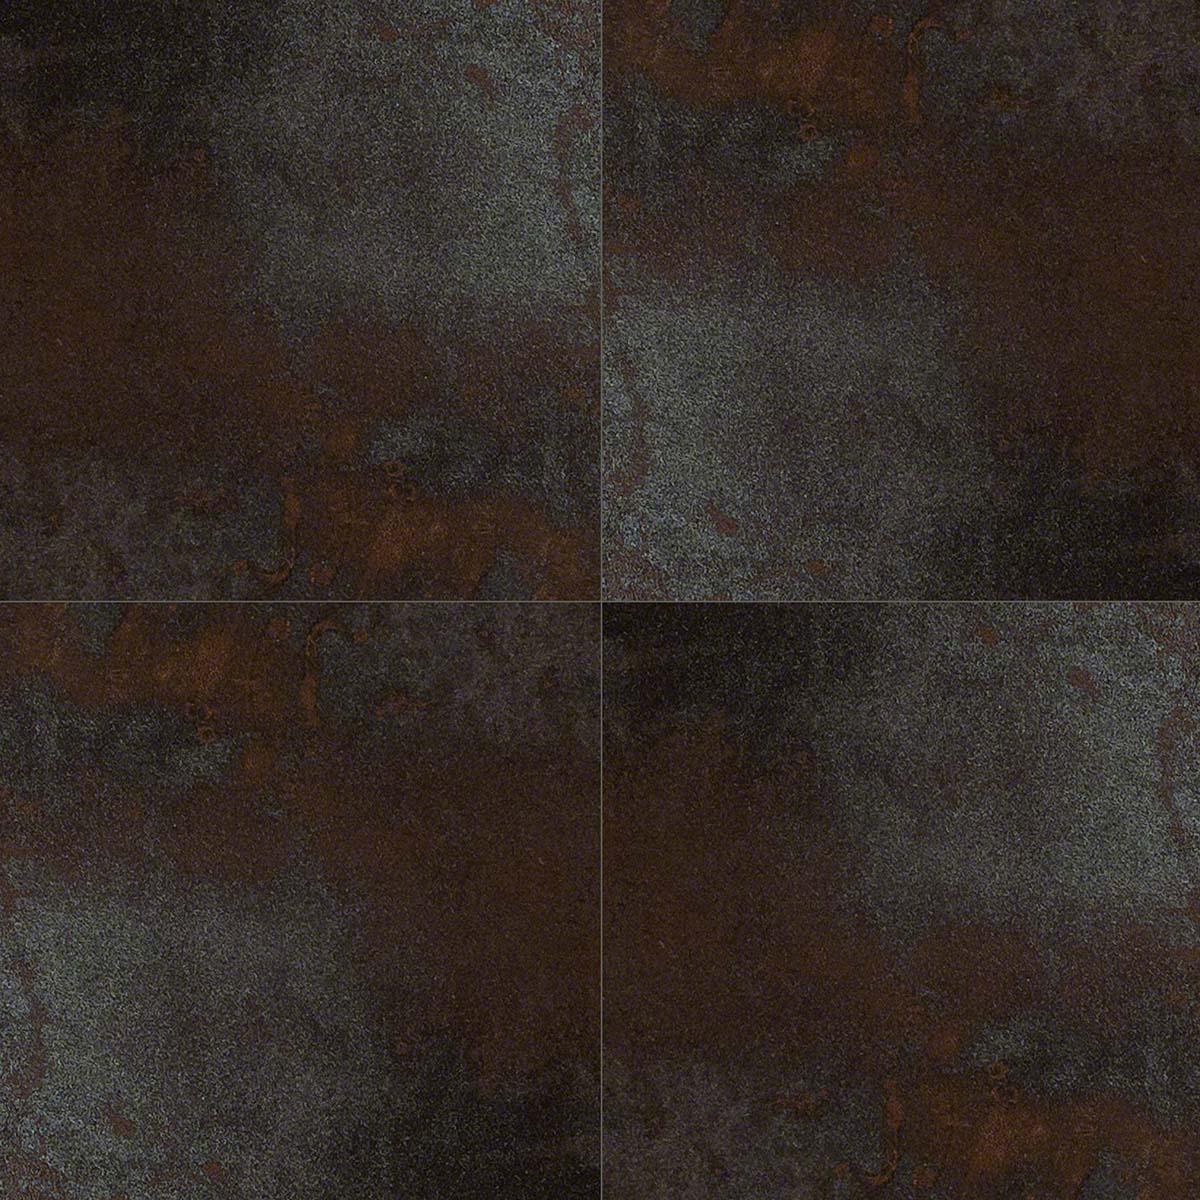 Floor tiles ottawa image collections tile flooring design ideas ceramic tile ottawa images tile flooring design ideas ceramic tiles ottawa images tile flooring design ideas doublecrazyfo Gallery